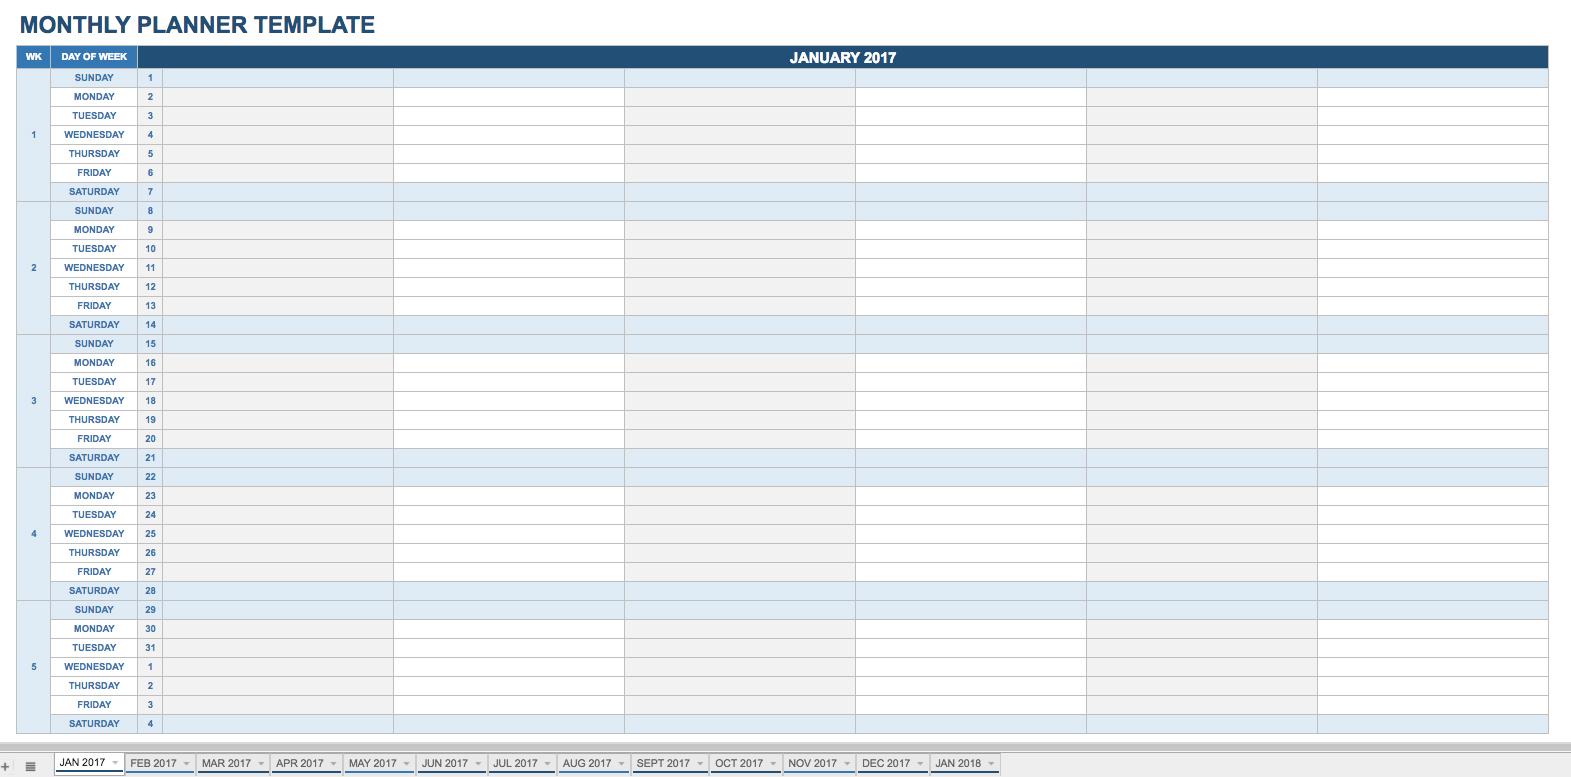 007 Google Sheets Calendar Template Ideas Ic Monthly